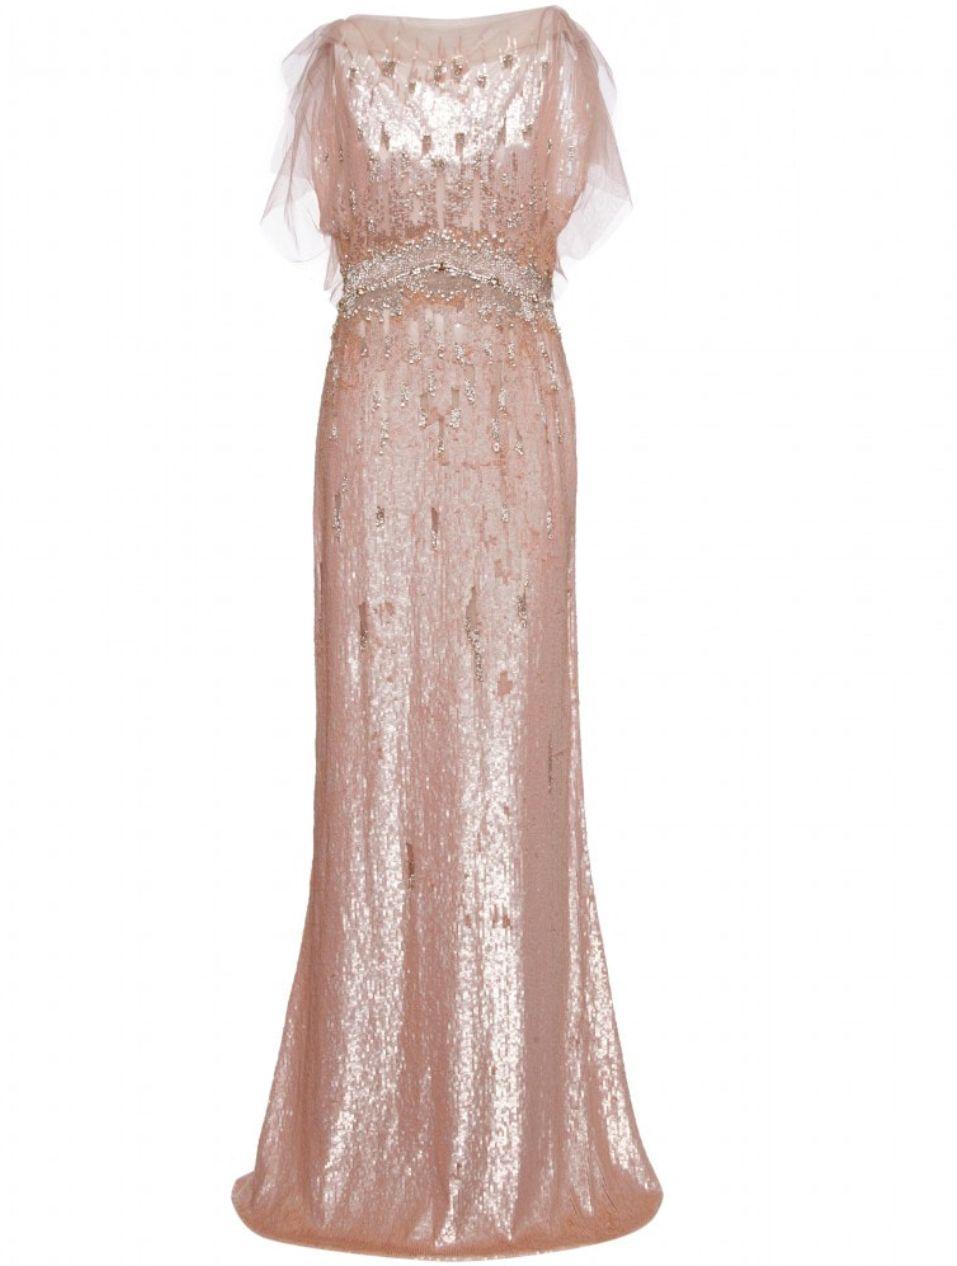 Jenny Packham Pearlescent Pink Sequin Gown | feminine | Pinterest ...